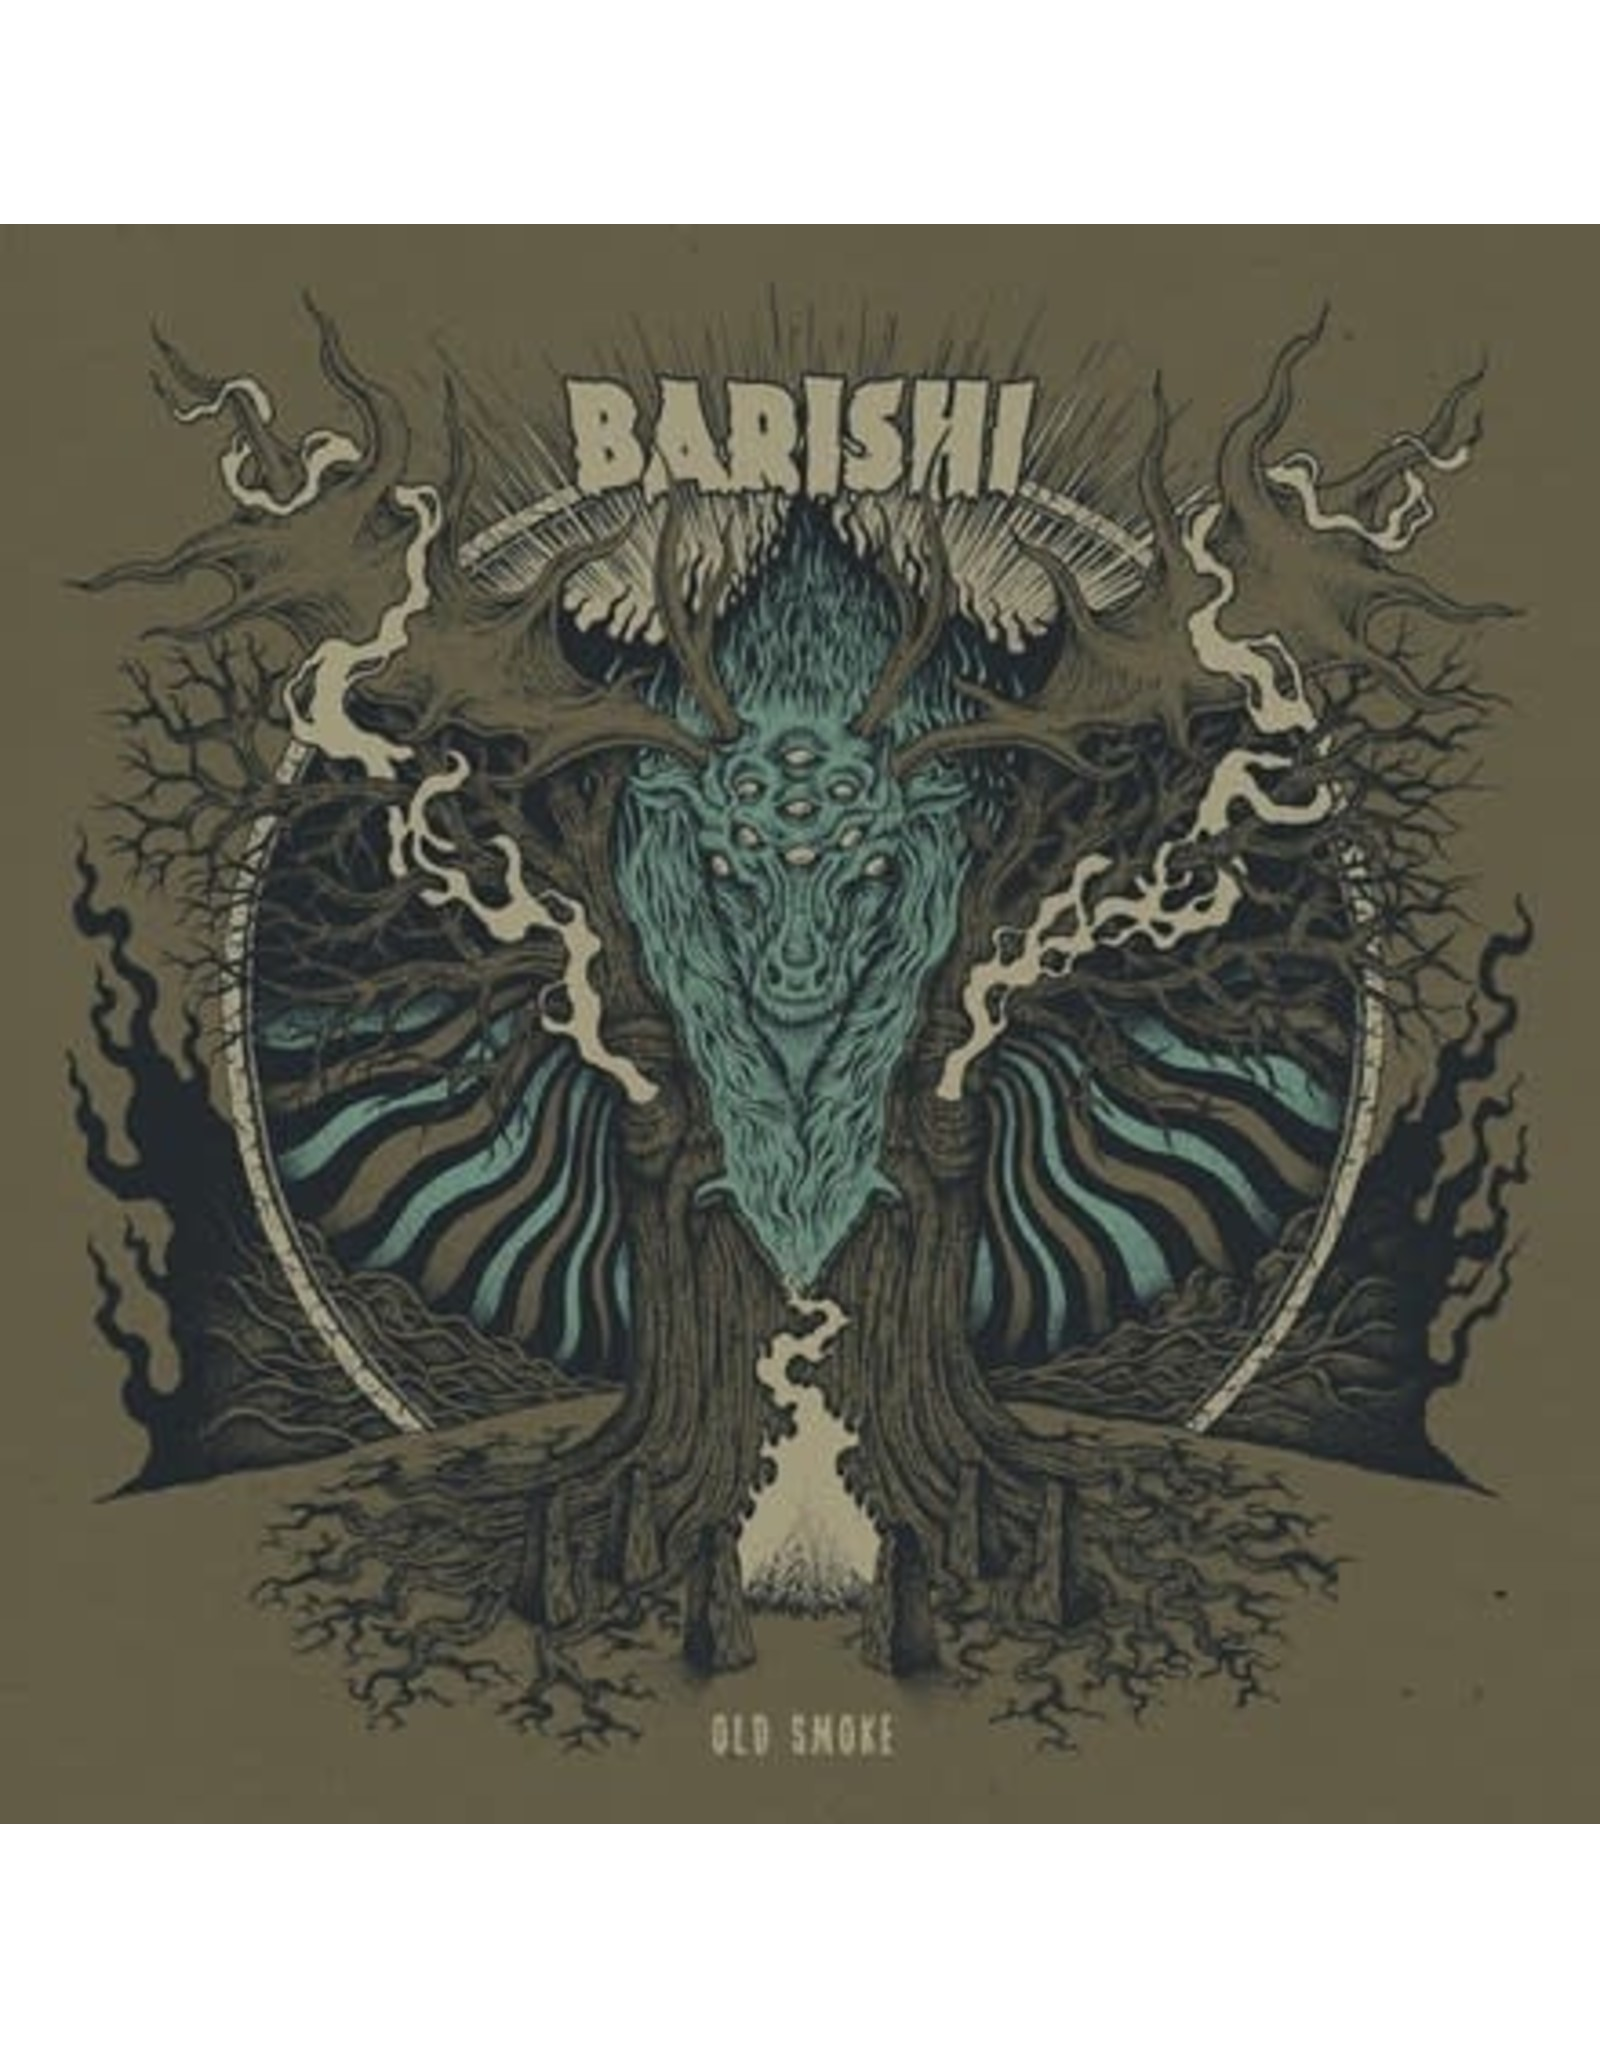 Season of Mist Barishi: Old Smoke LP